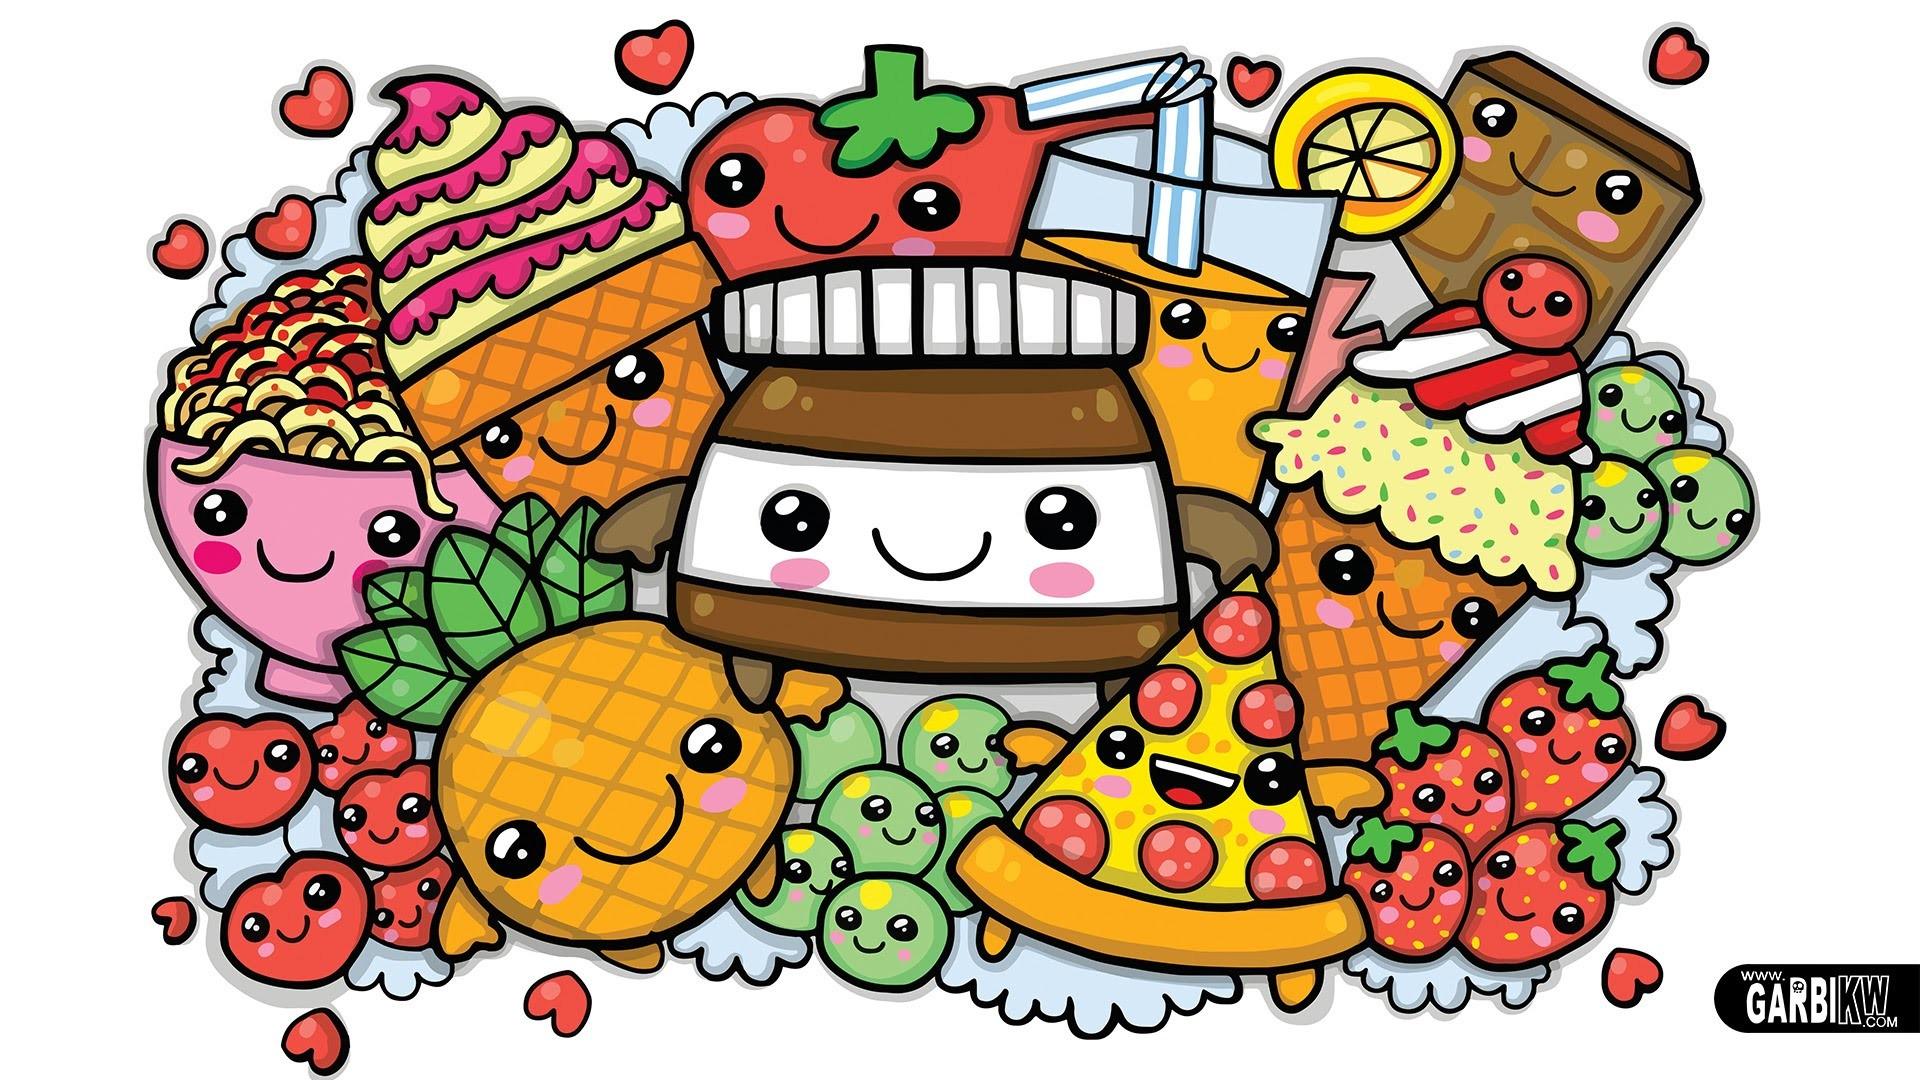 Cute Kawaii Food Wallpaper 57 images 1920x1080